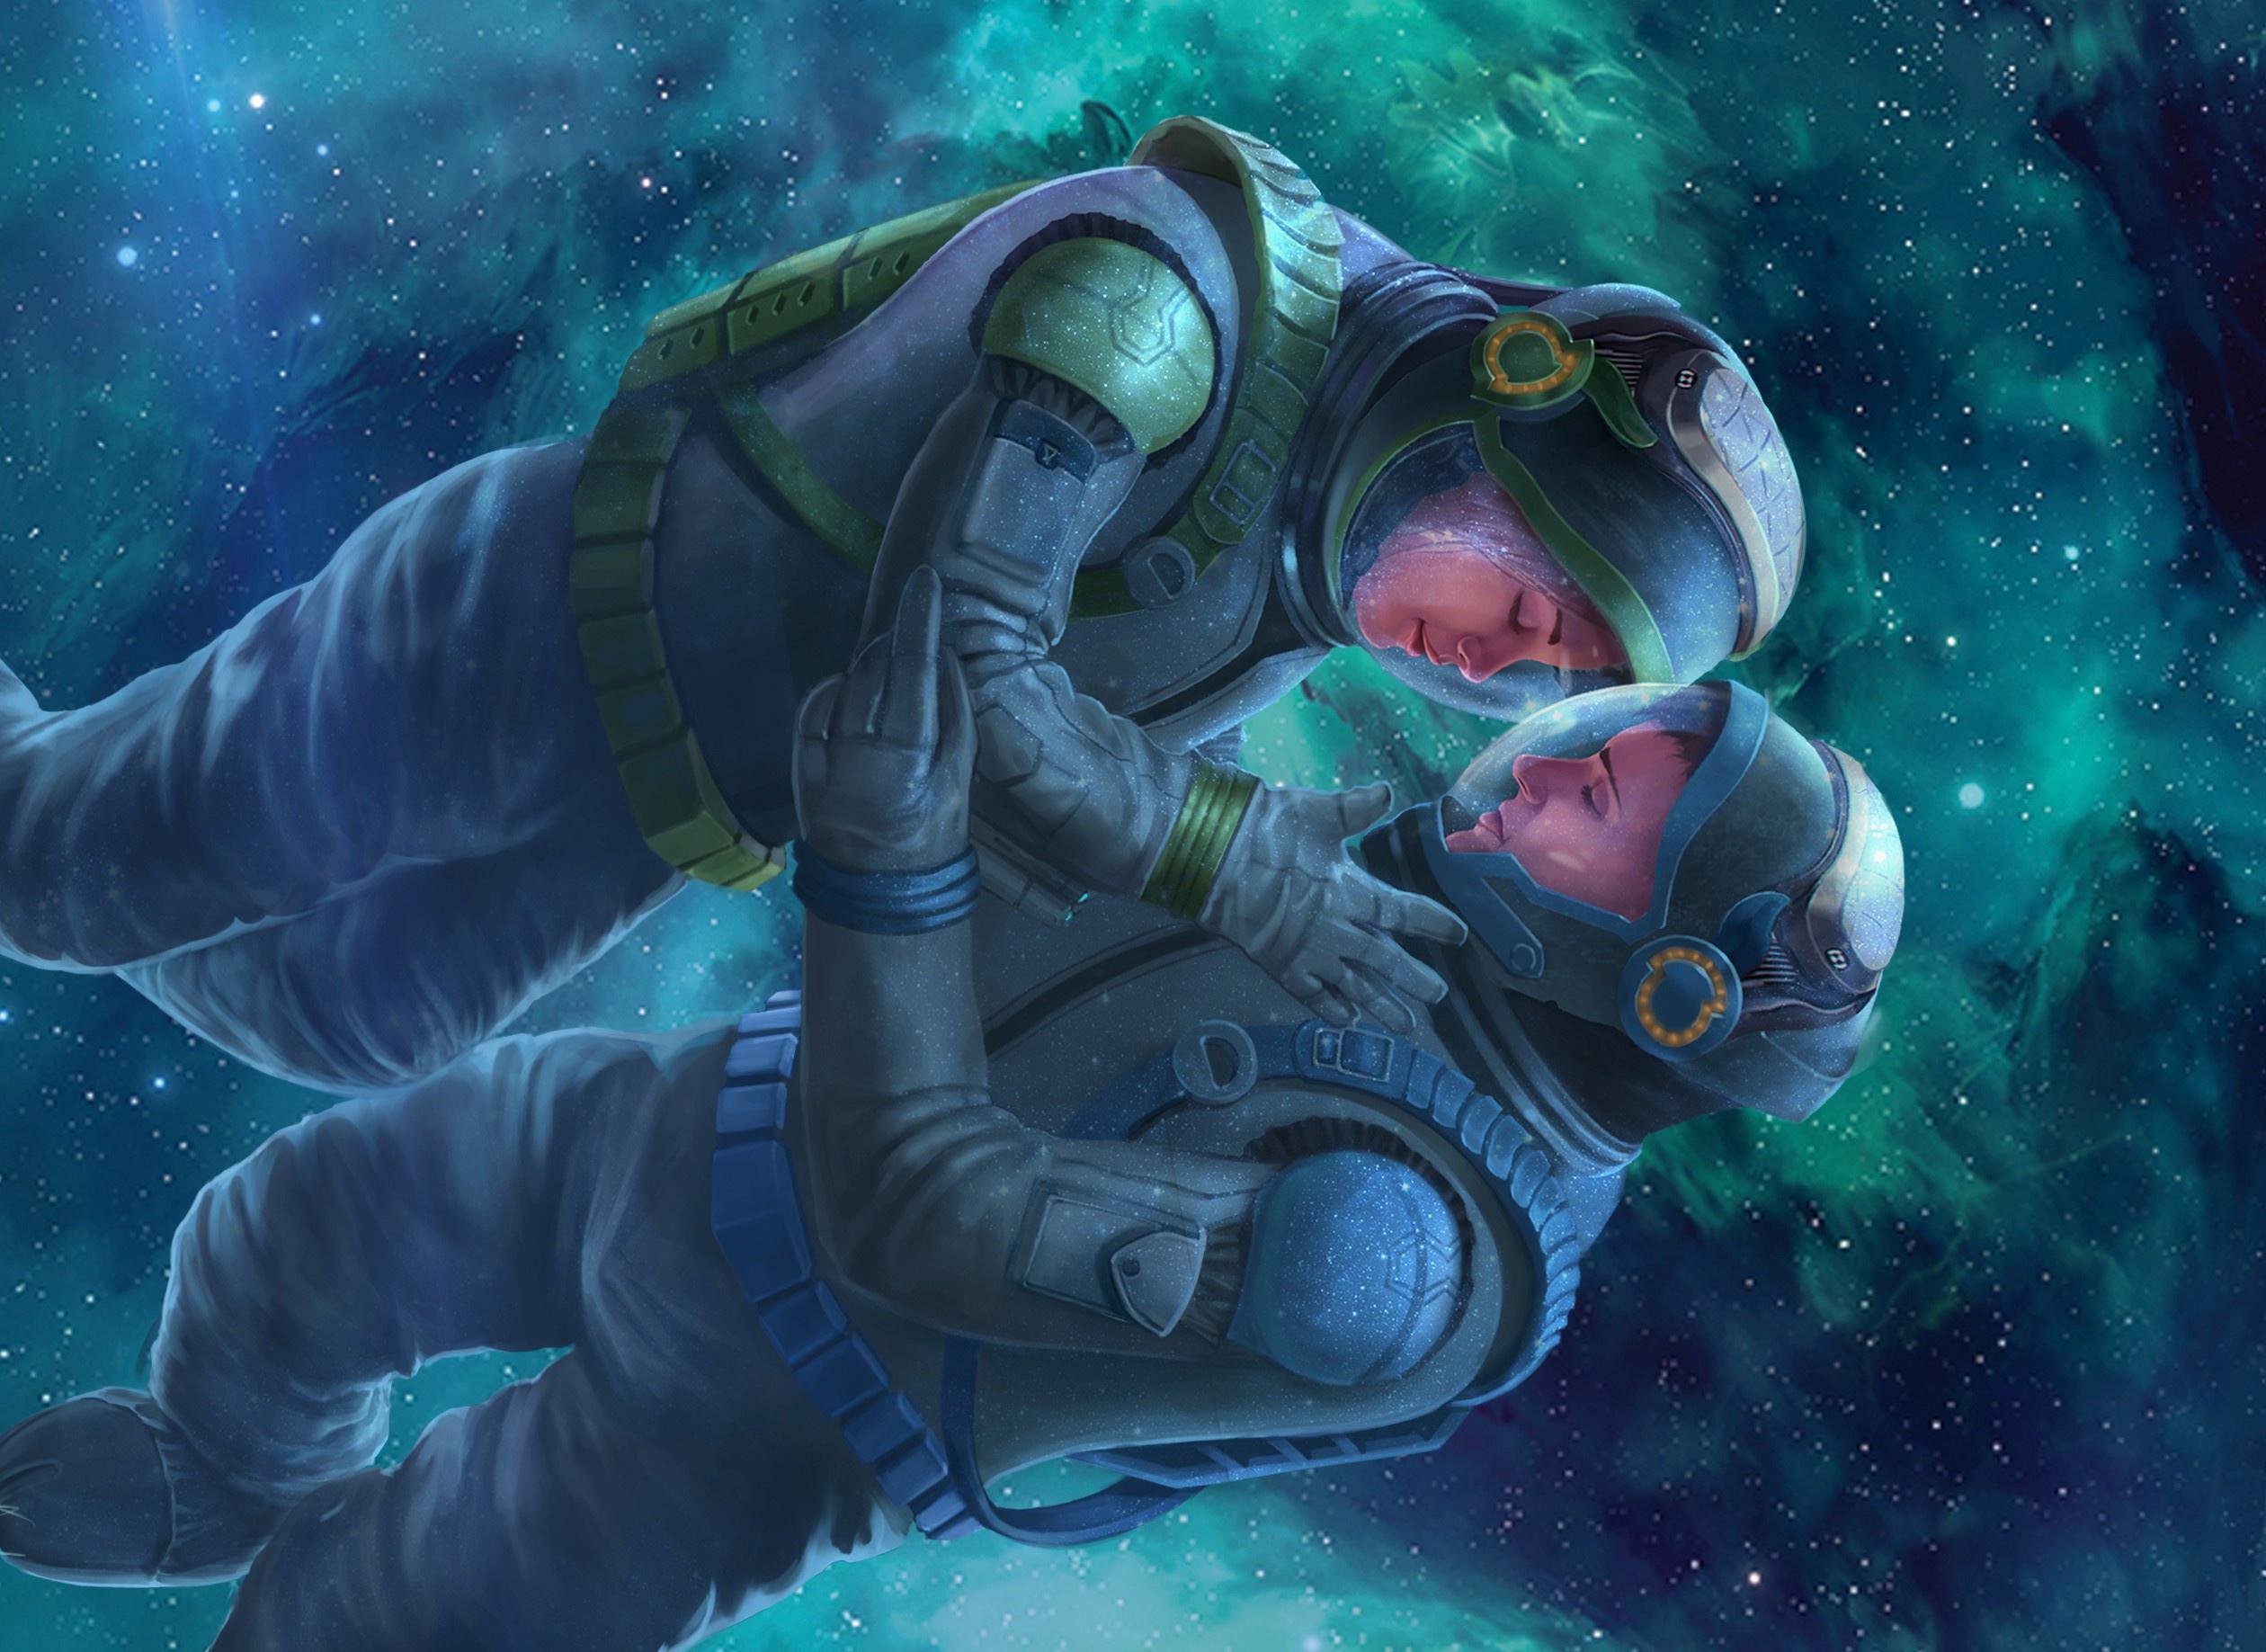 astronaut space love - photo #27